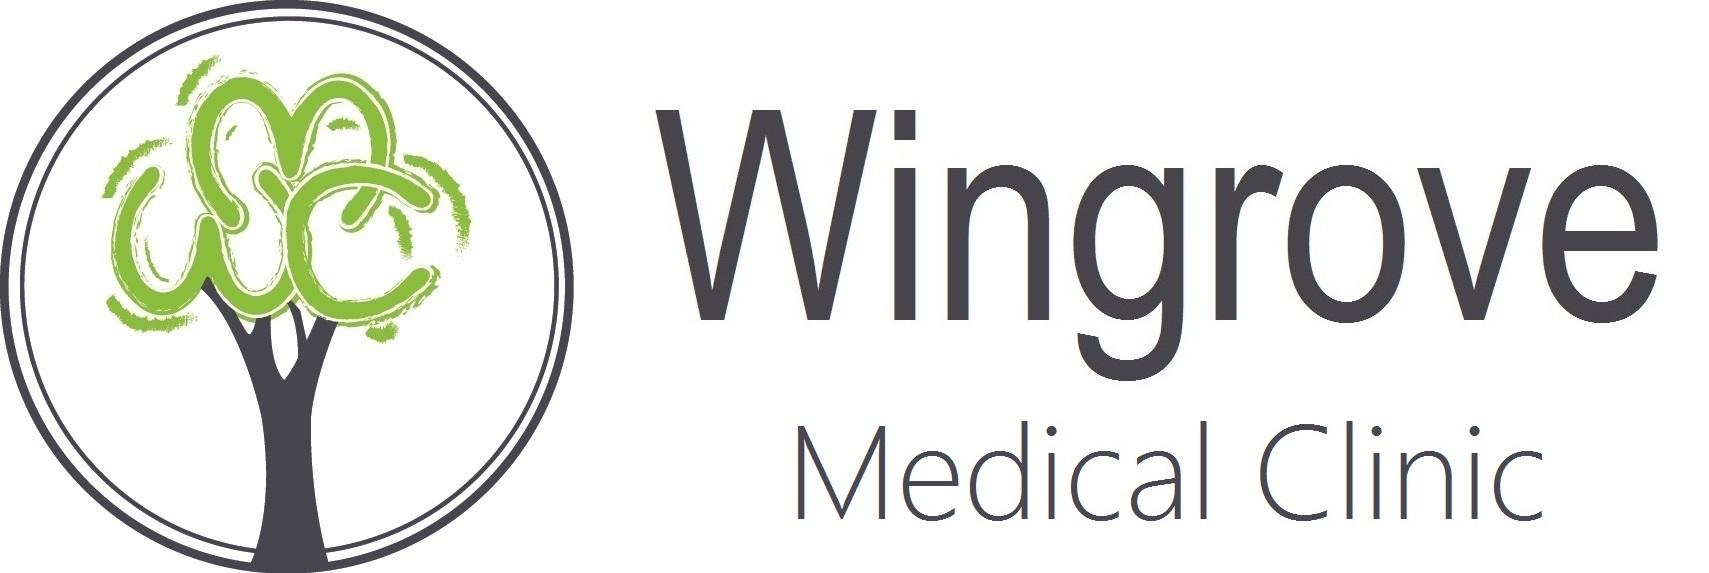 Wingrove Medical Clinic Fairfield Logo